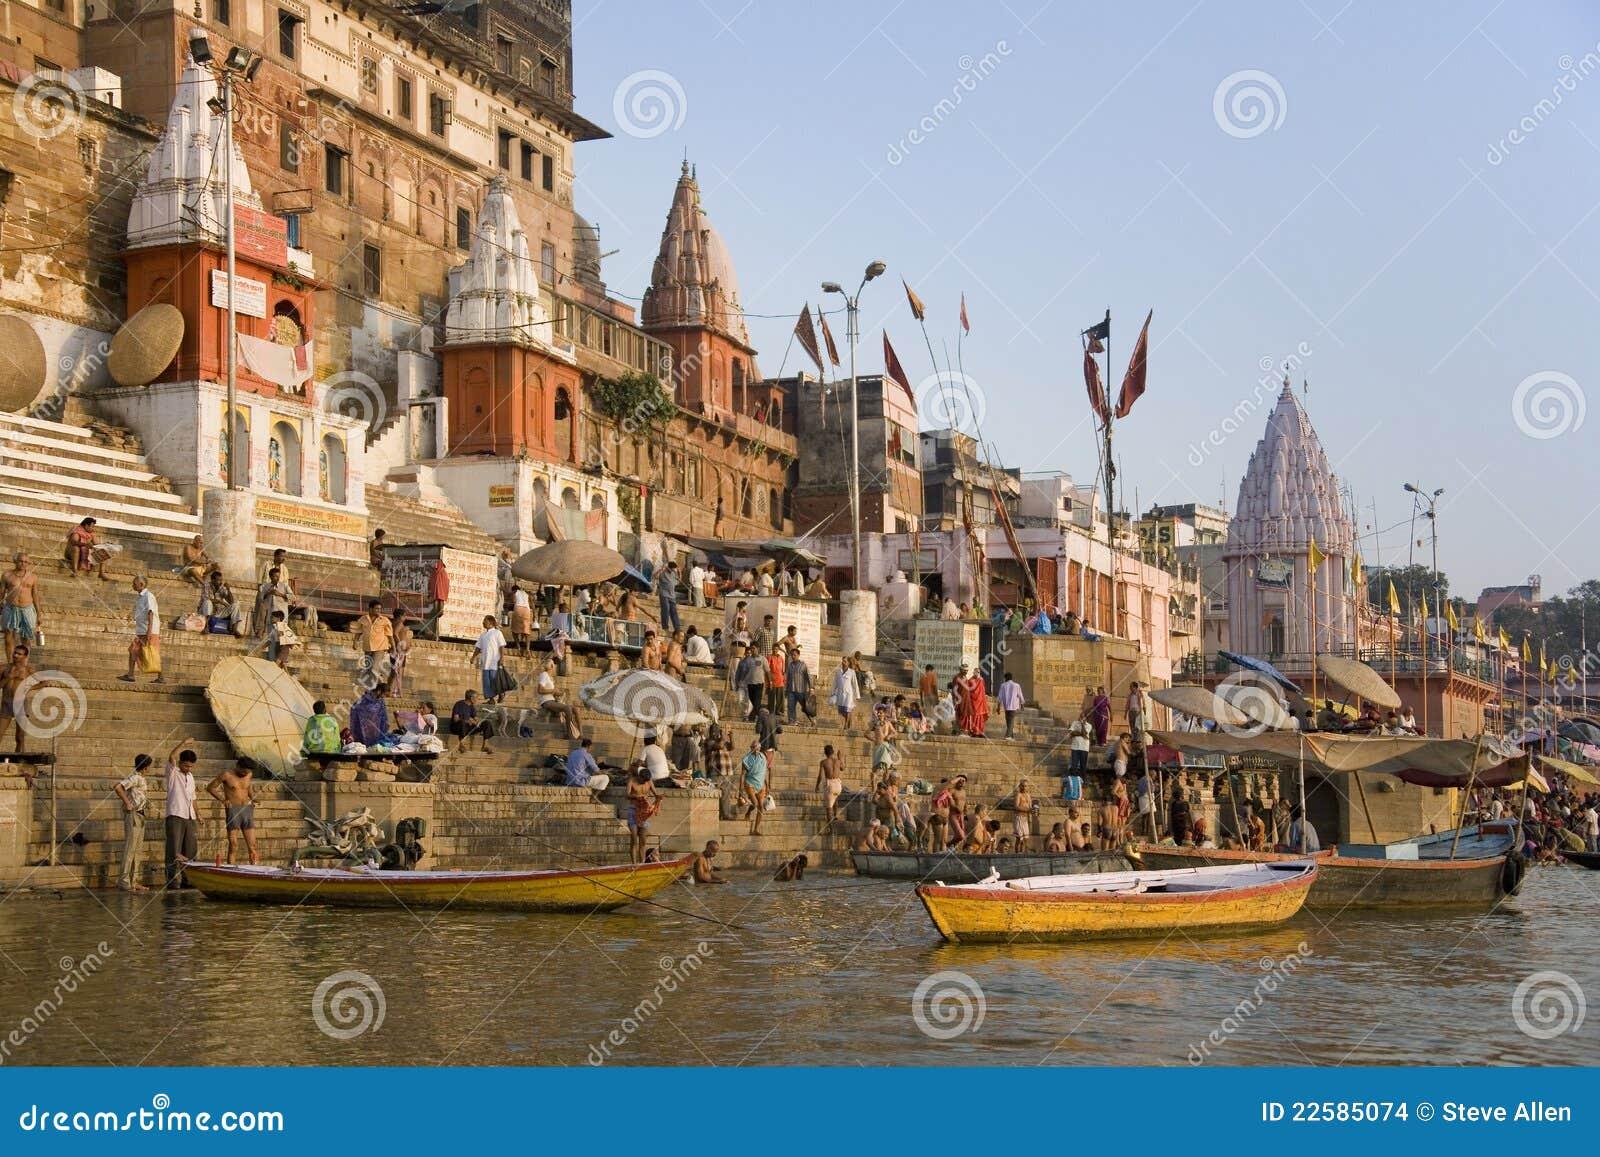 Stock Images Hindu Ghats River Ganges Varanasi India Image22585074 additionally Stock Image Google Maps Car Bangkok Image24034301 also 4k 1080 City Skyline Sunset Time Lapse also 2015 Toyota Camry Facelift Launched Thailand 172729 furthermore Hotel. on thailand bangkok car audio